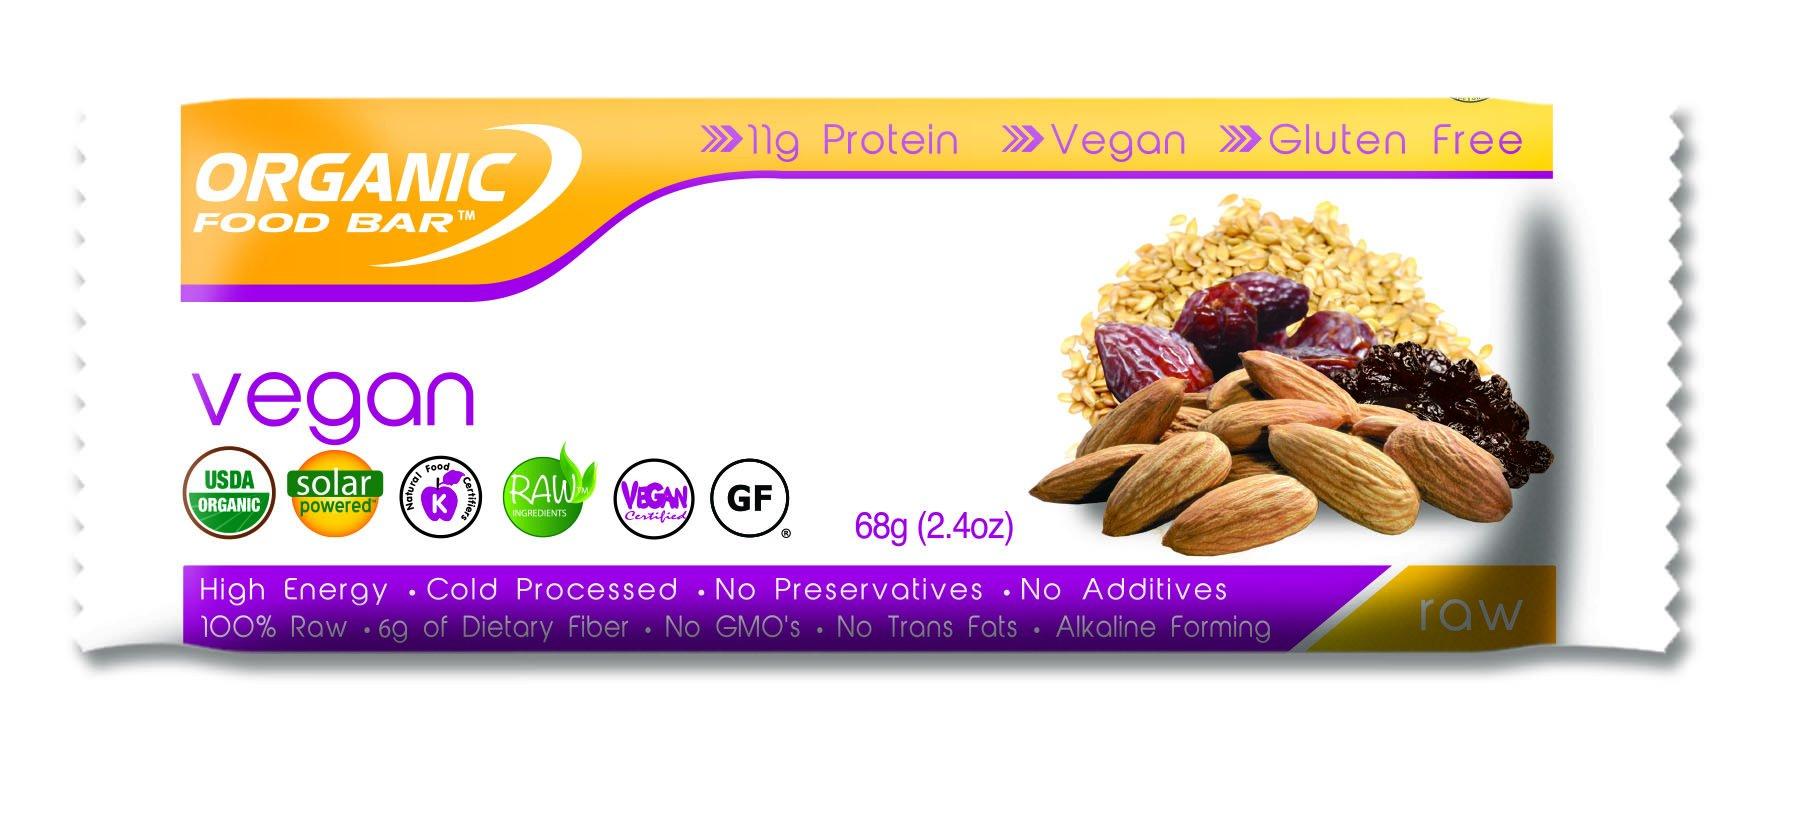 Organic Food Bar - Vegan Bars, Certfied Organic Vegan Protein Bars (Pack of 12, 2.4 oz) by Organic Food Bar